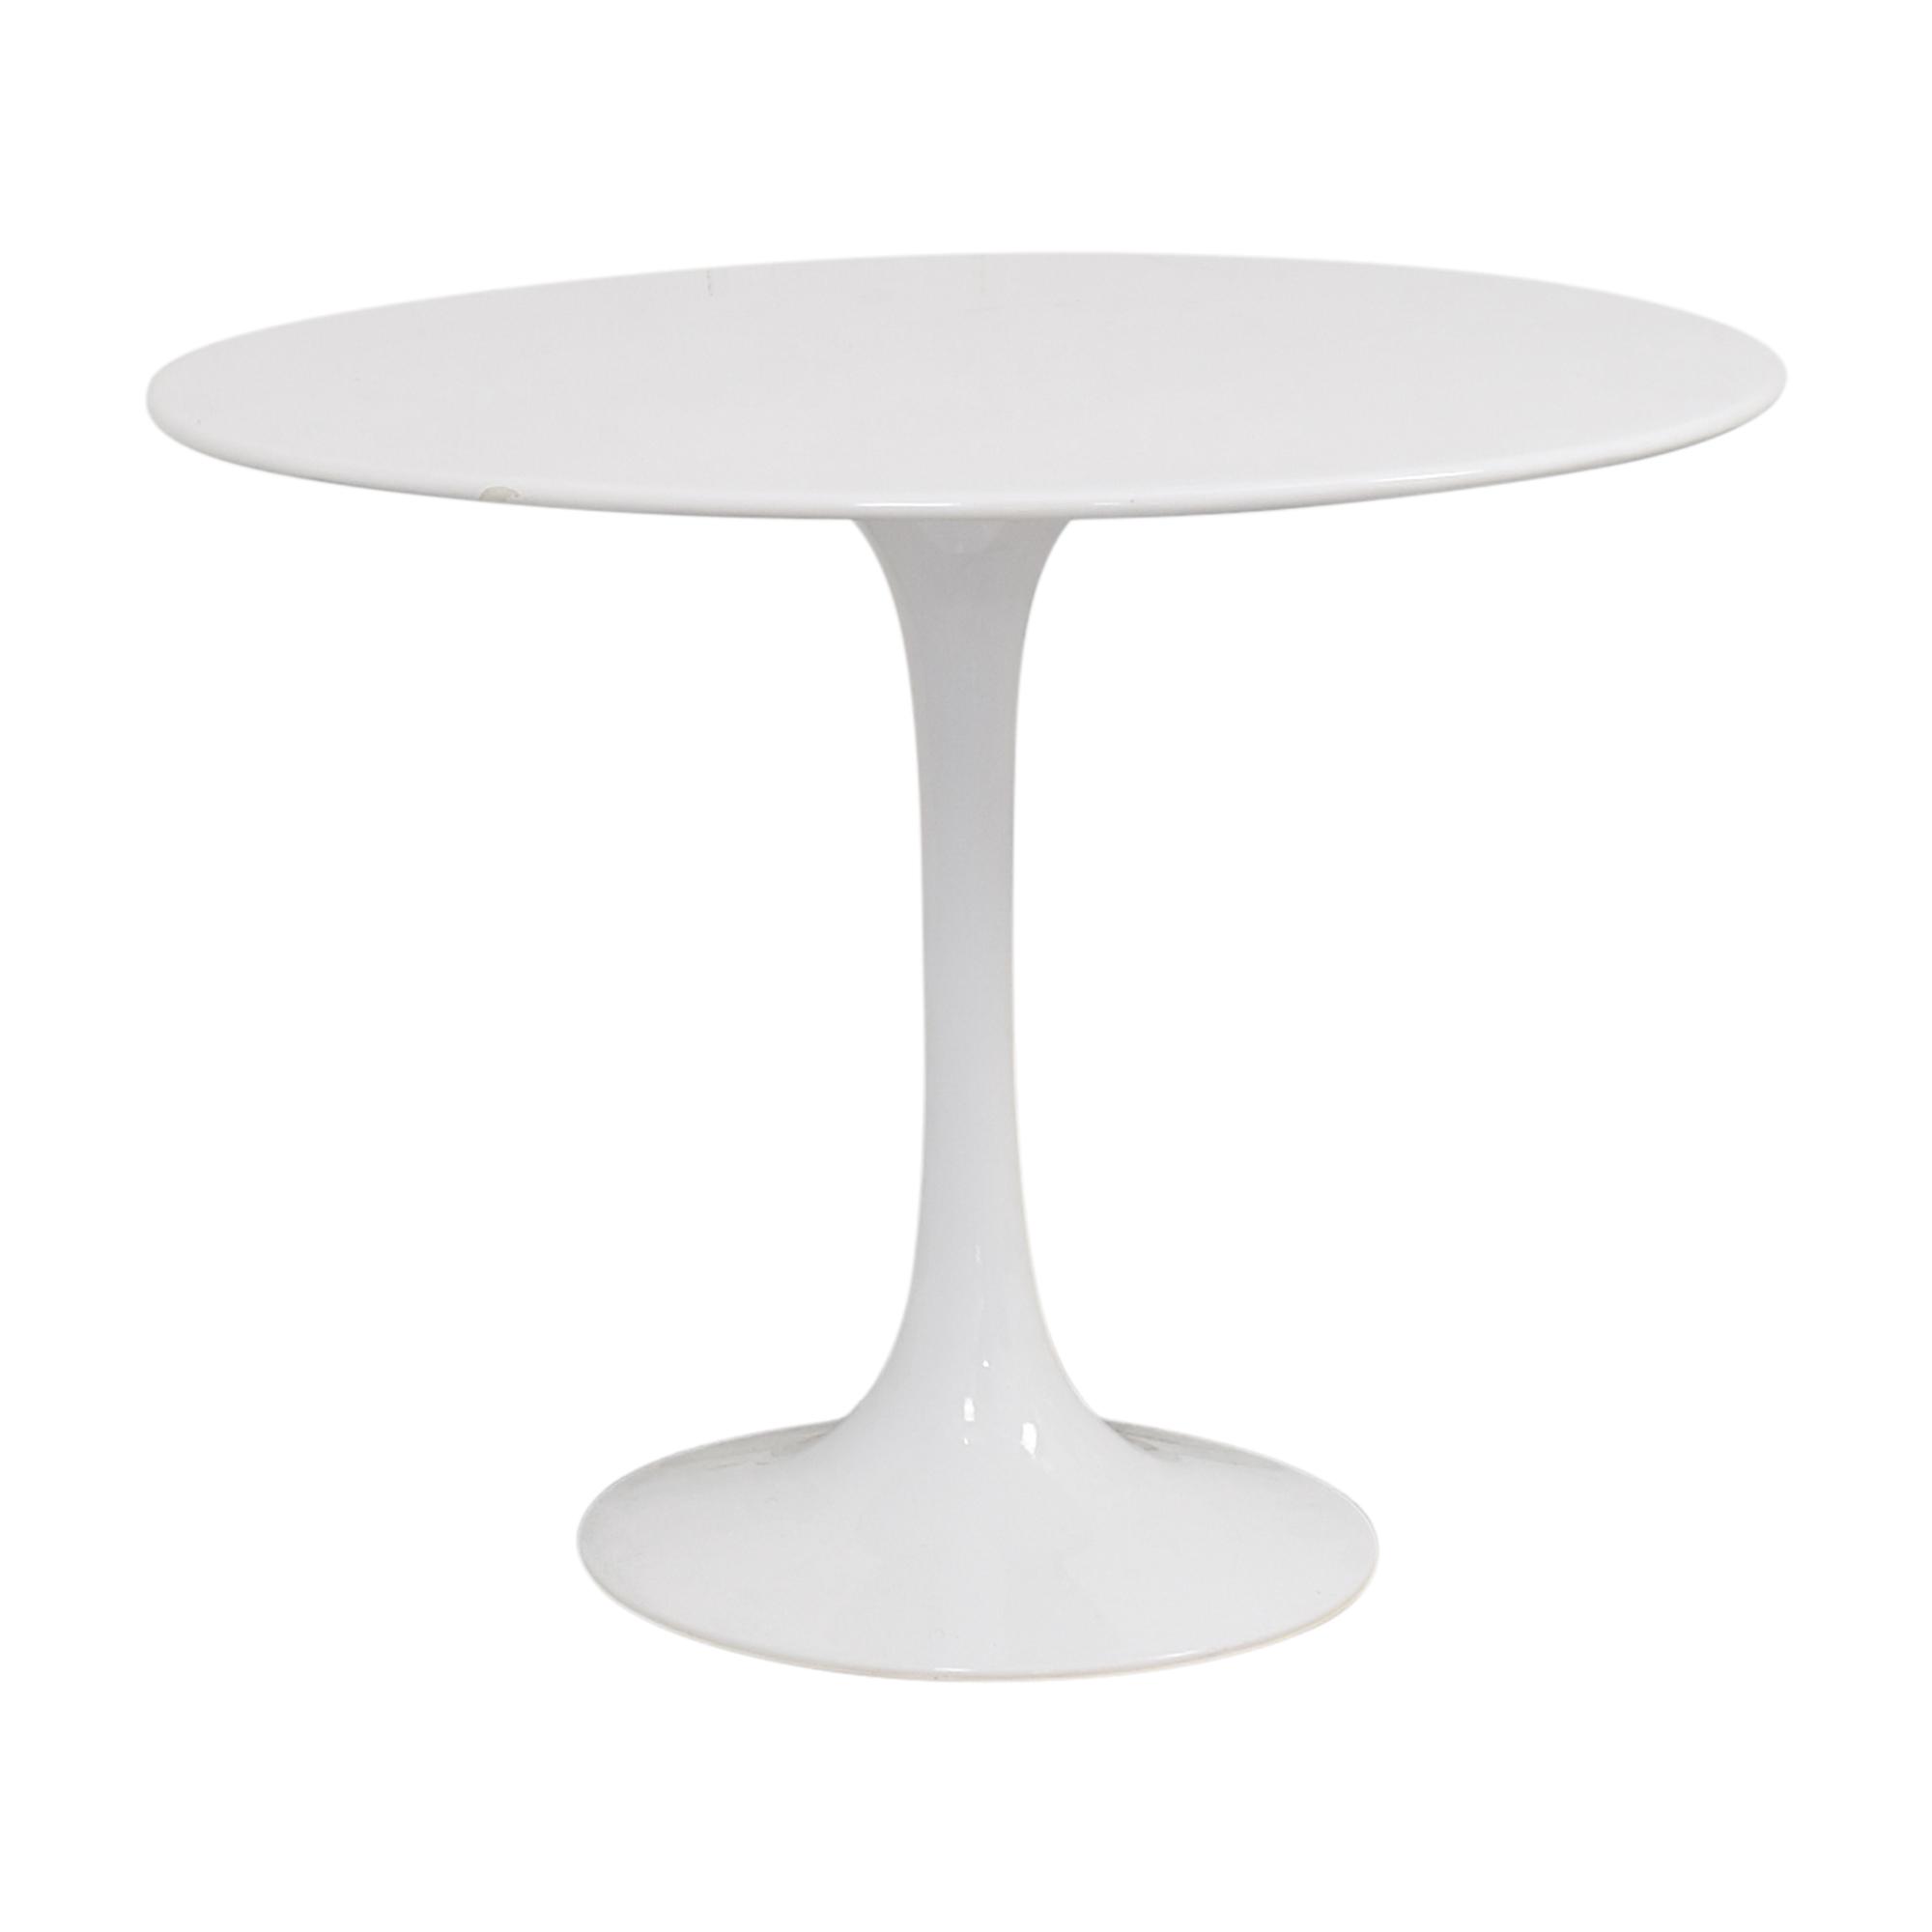 buy Edgemod Daisy Dining Table Edgemod Dinner Tables